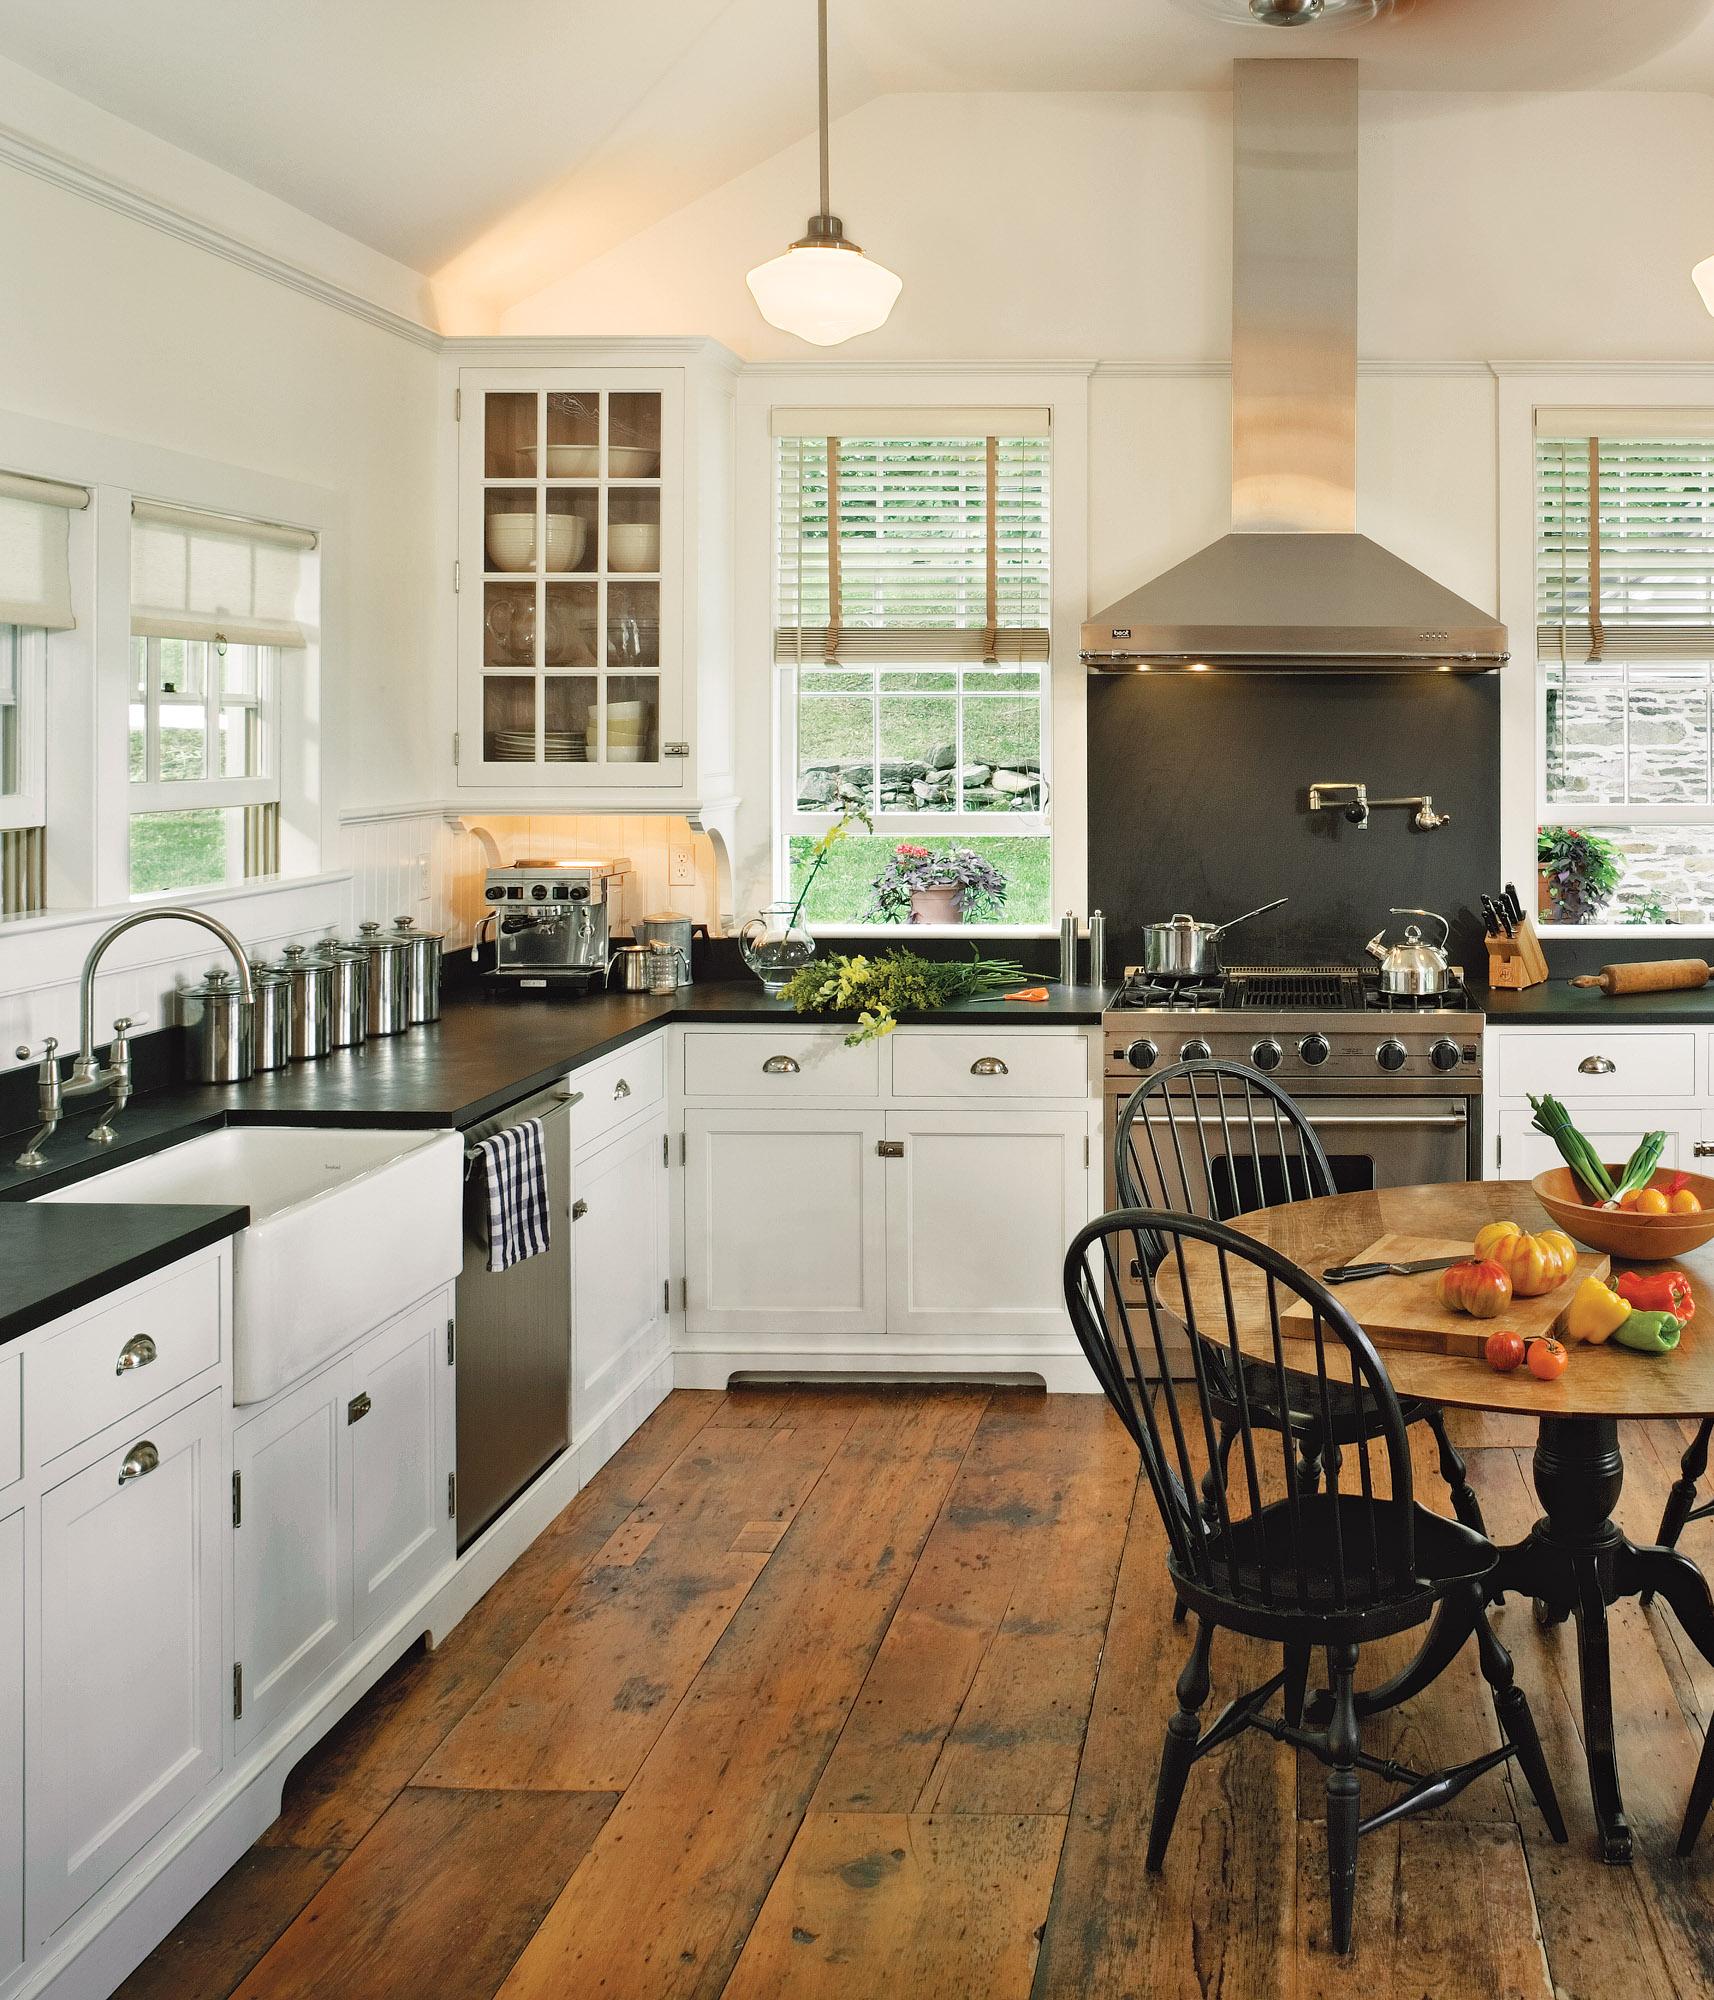 White Kitchens For Vintage Homes Old House Journal Magazine